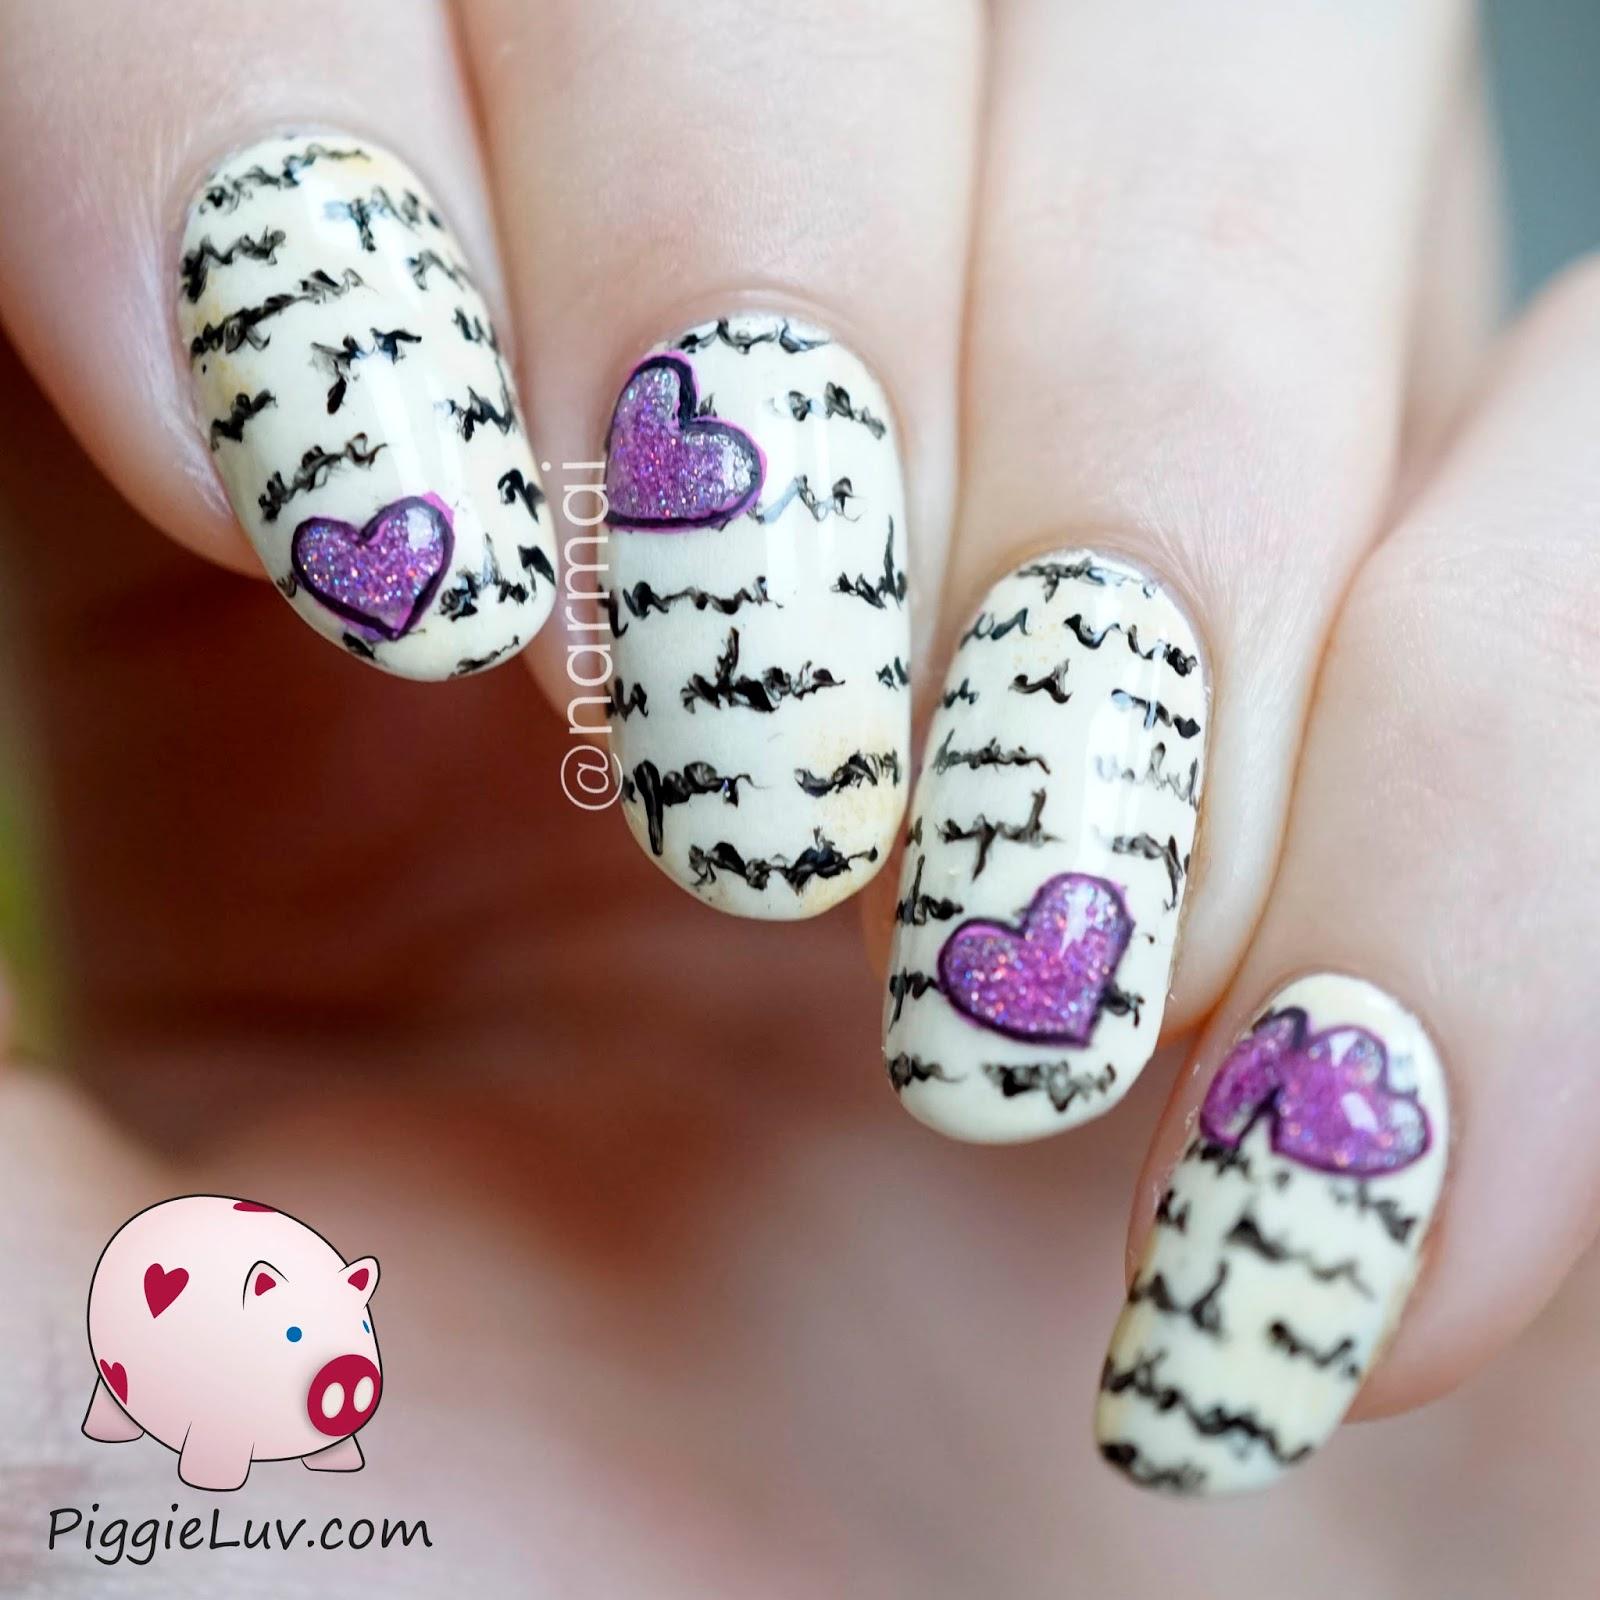 Piggieluv Love Letter Nail Art Hpb Valentines Day Linkup